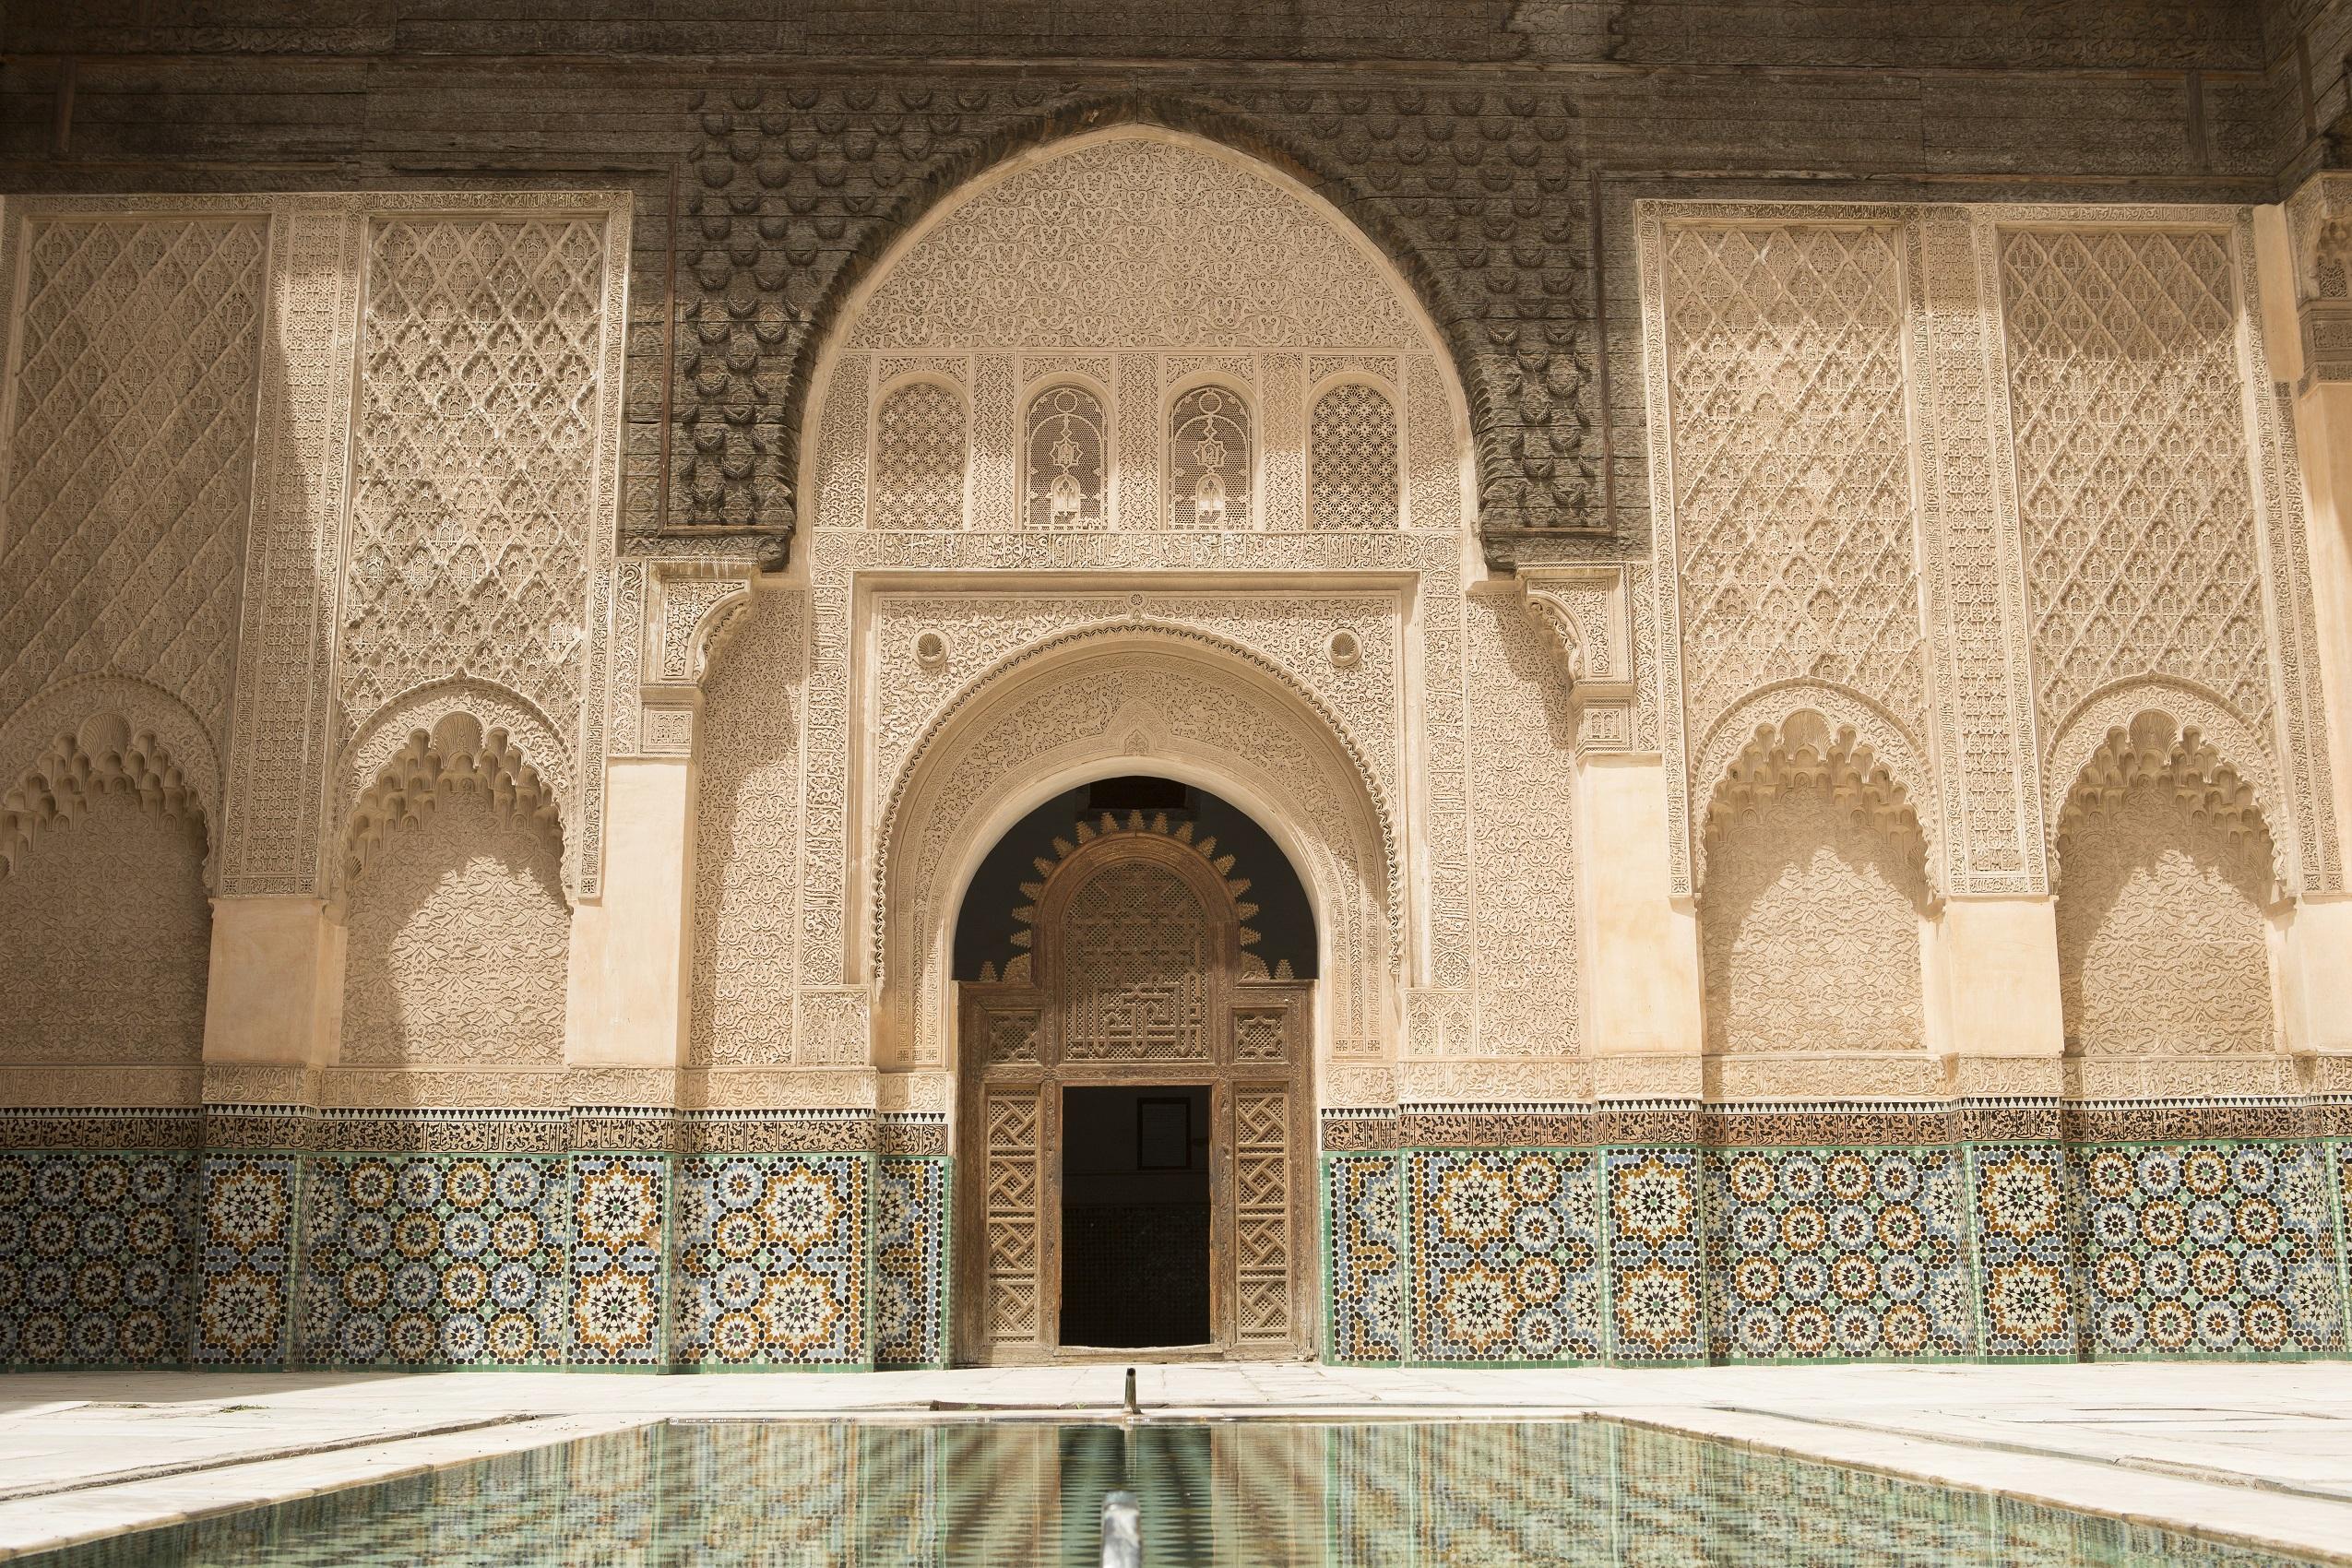 Ben Youssef Medersa, Marrakech, Morocco